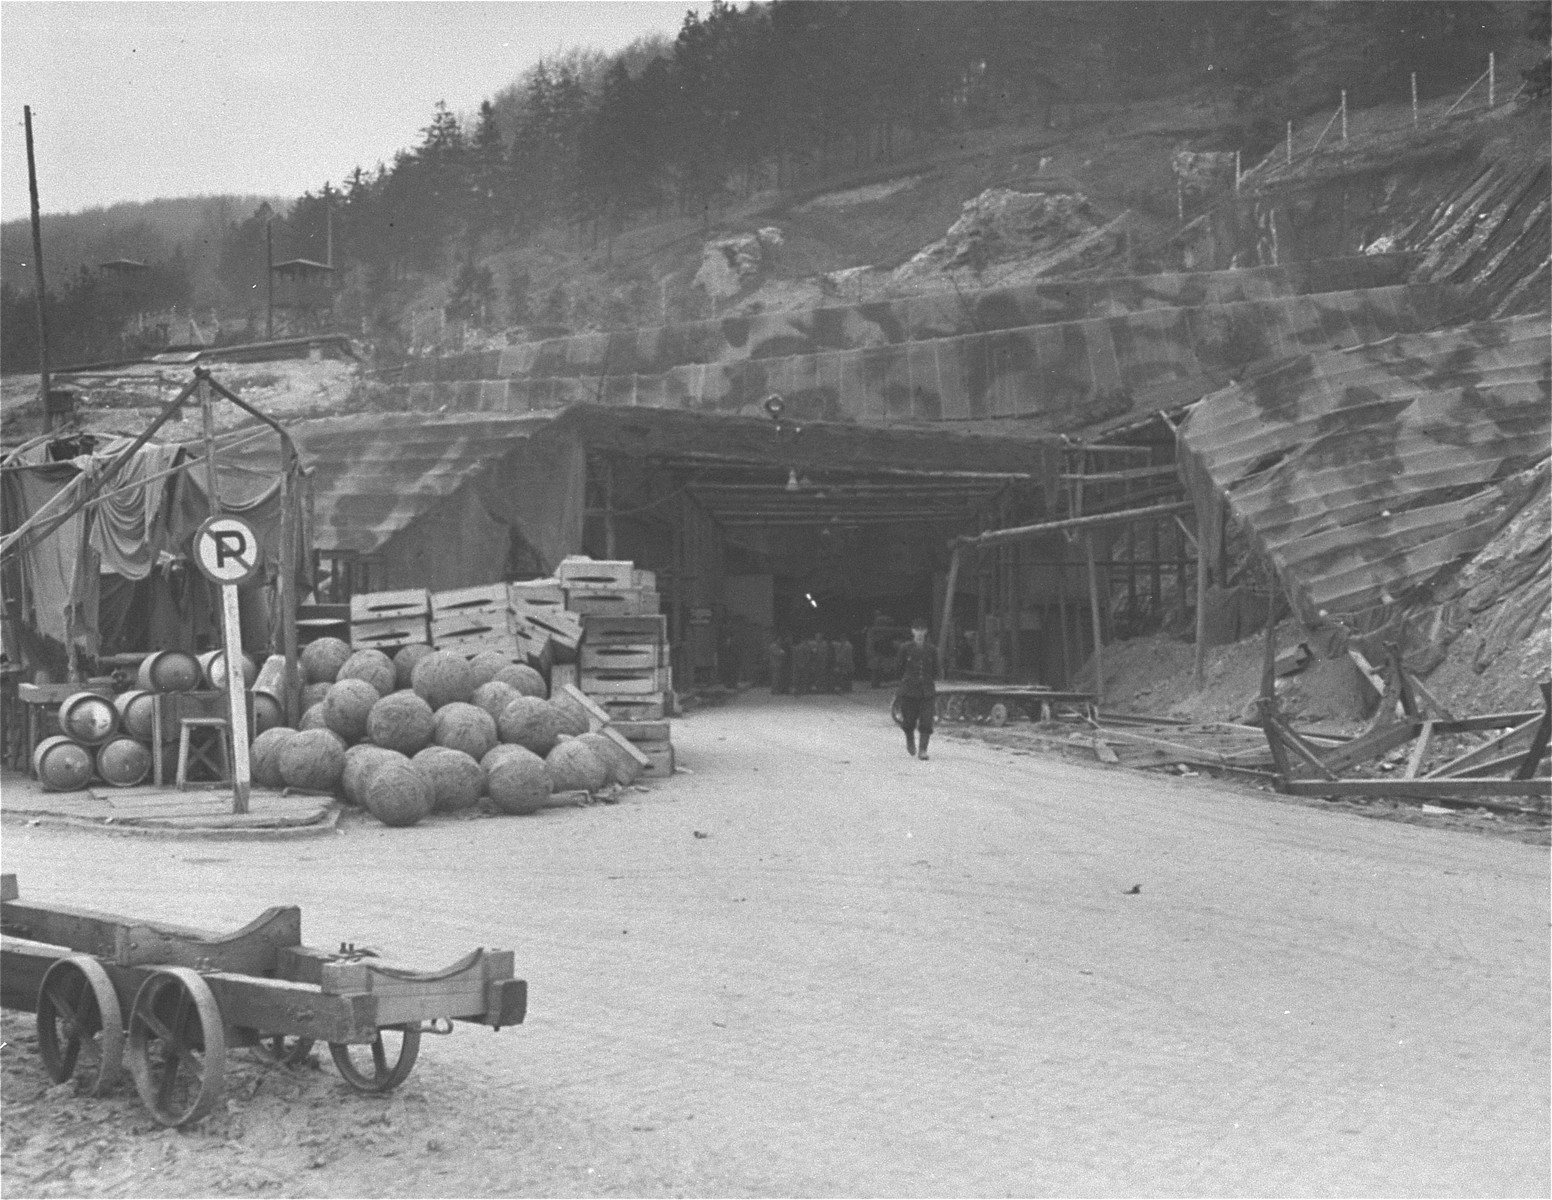 The camoflaged entrance to the underground rocket factory at Dora-Mittelbau.